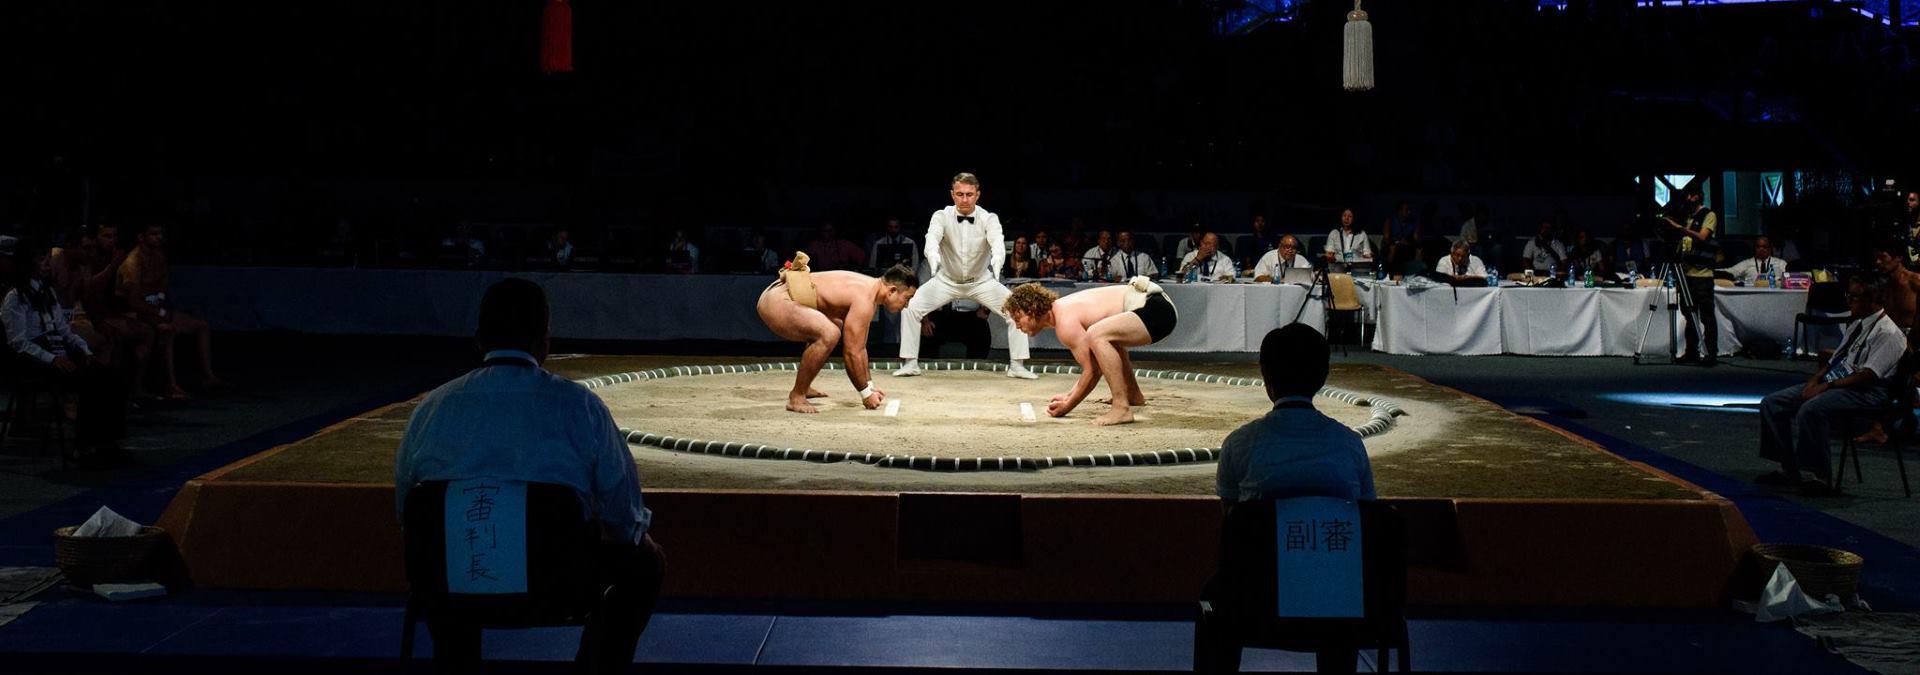 VIDEO: Tradicionalan novogodišnji običaj Sumo boraca